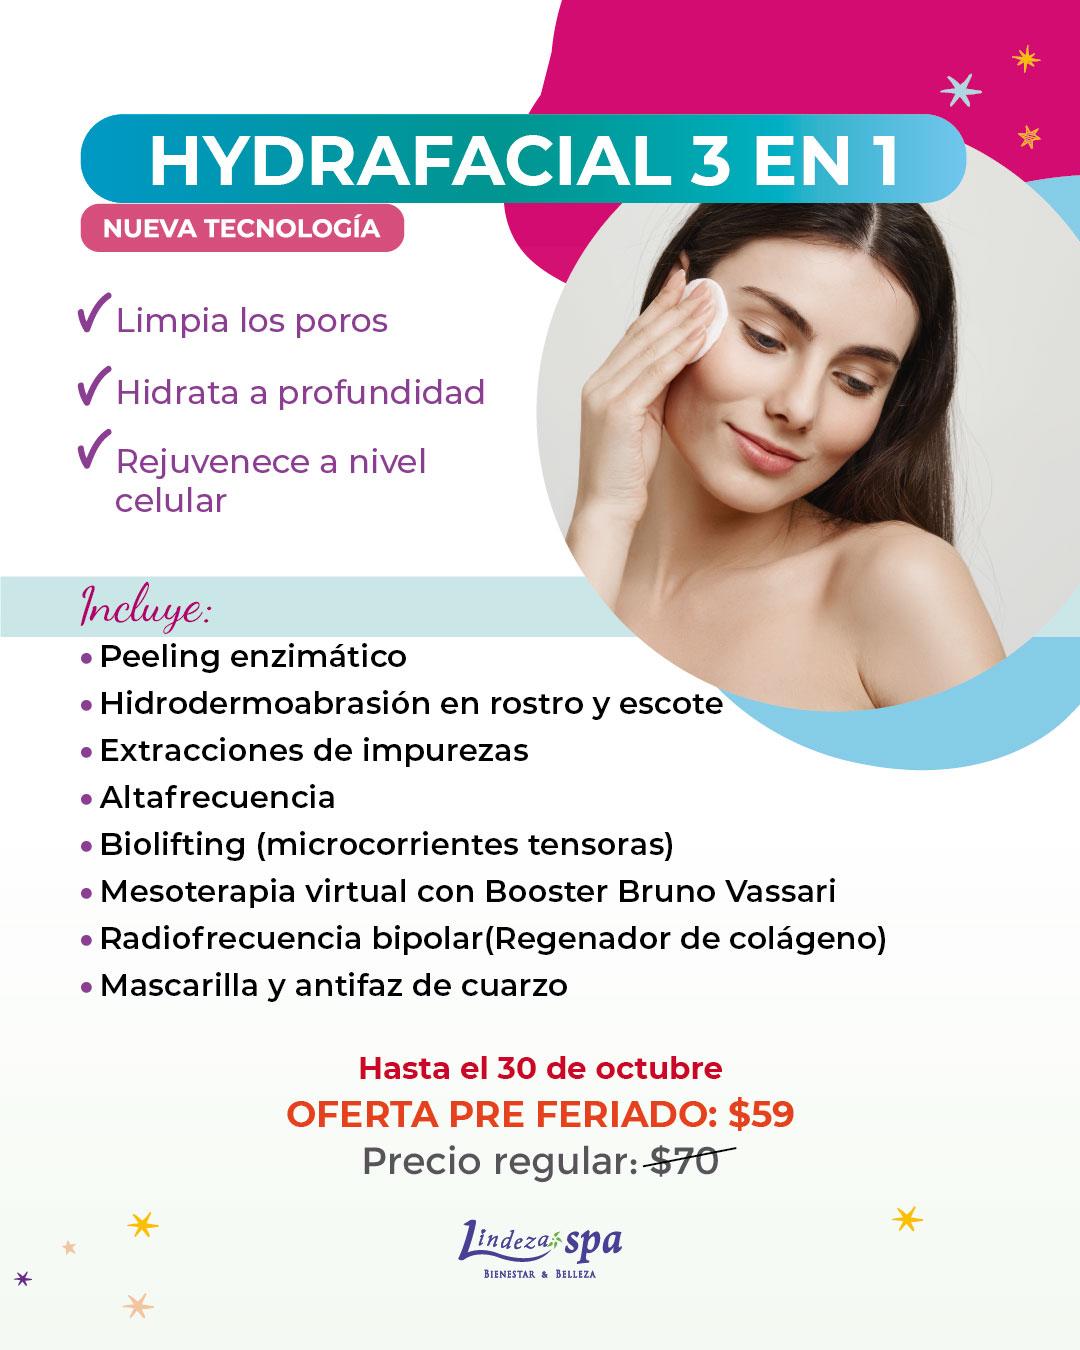 Hydrafacial, hidrodermoabrasion, spa en Guayaquil, dia de spa, Aqua Peel